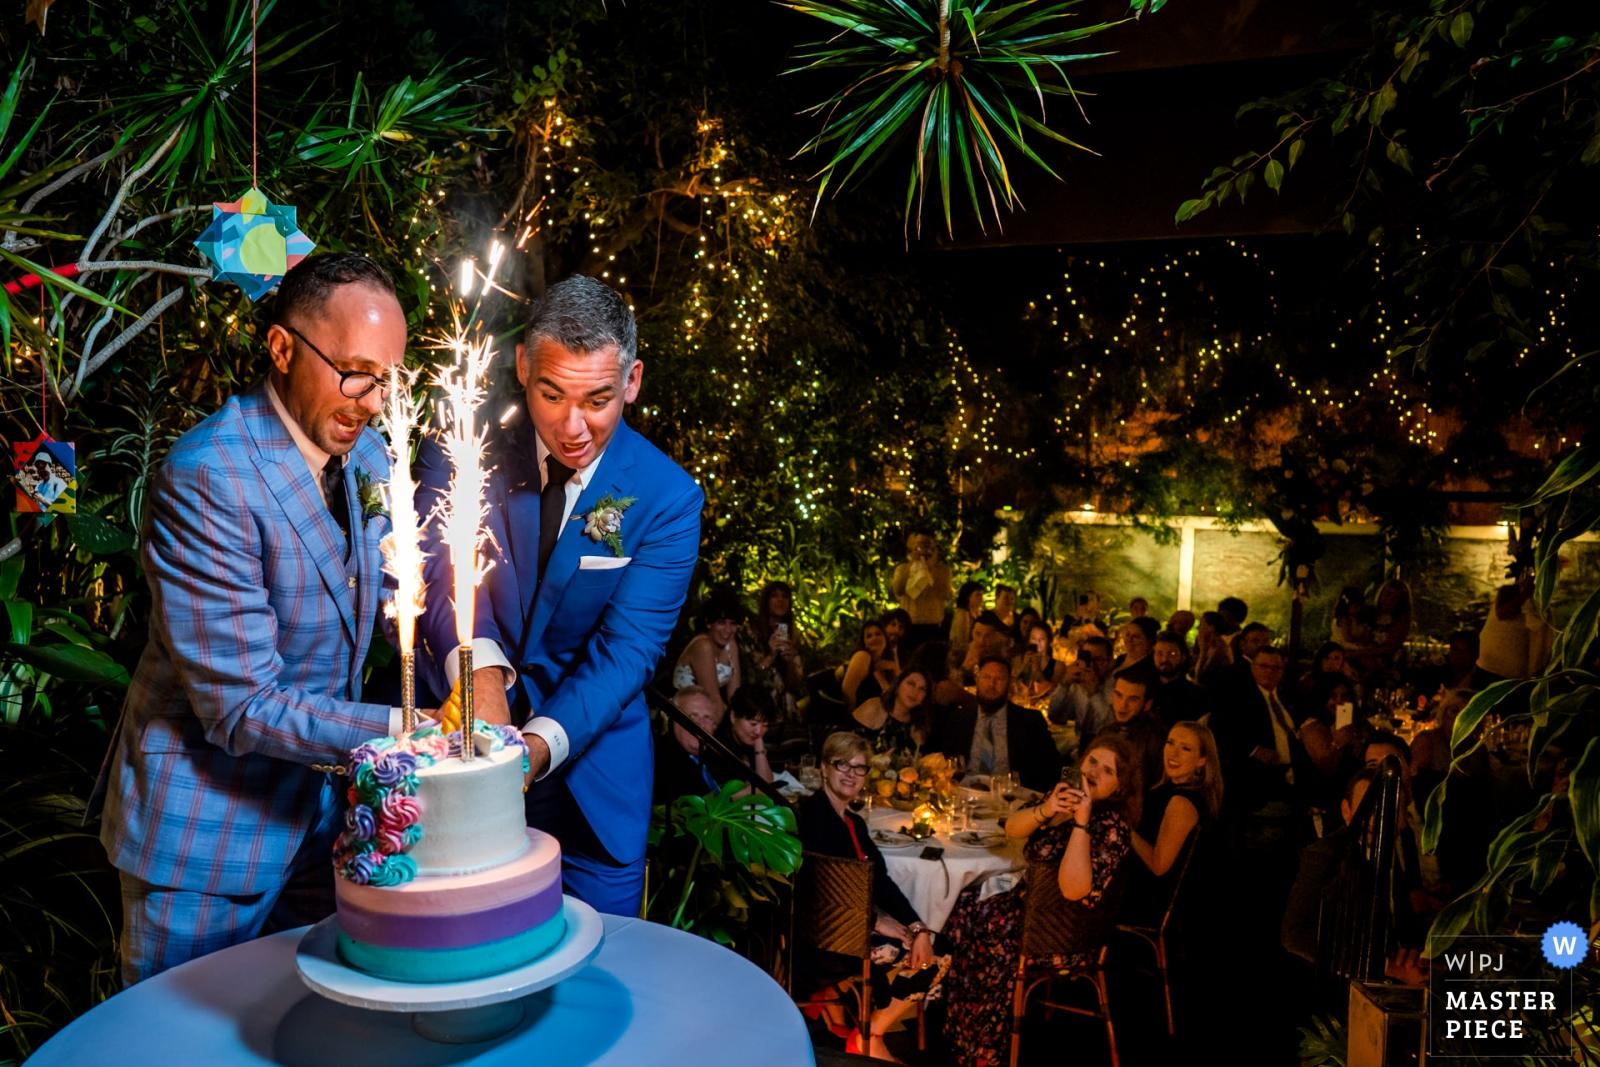 Wedding photo by Bee Two Sweet Photography, two grooms cut into their firecracker topped unicorn wedding cake - Arlington, Virginia Wedding Photography -  | Michael's Restaurant, Santa Monica CA